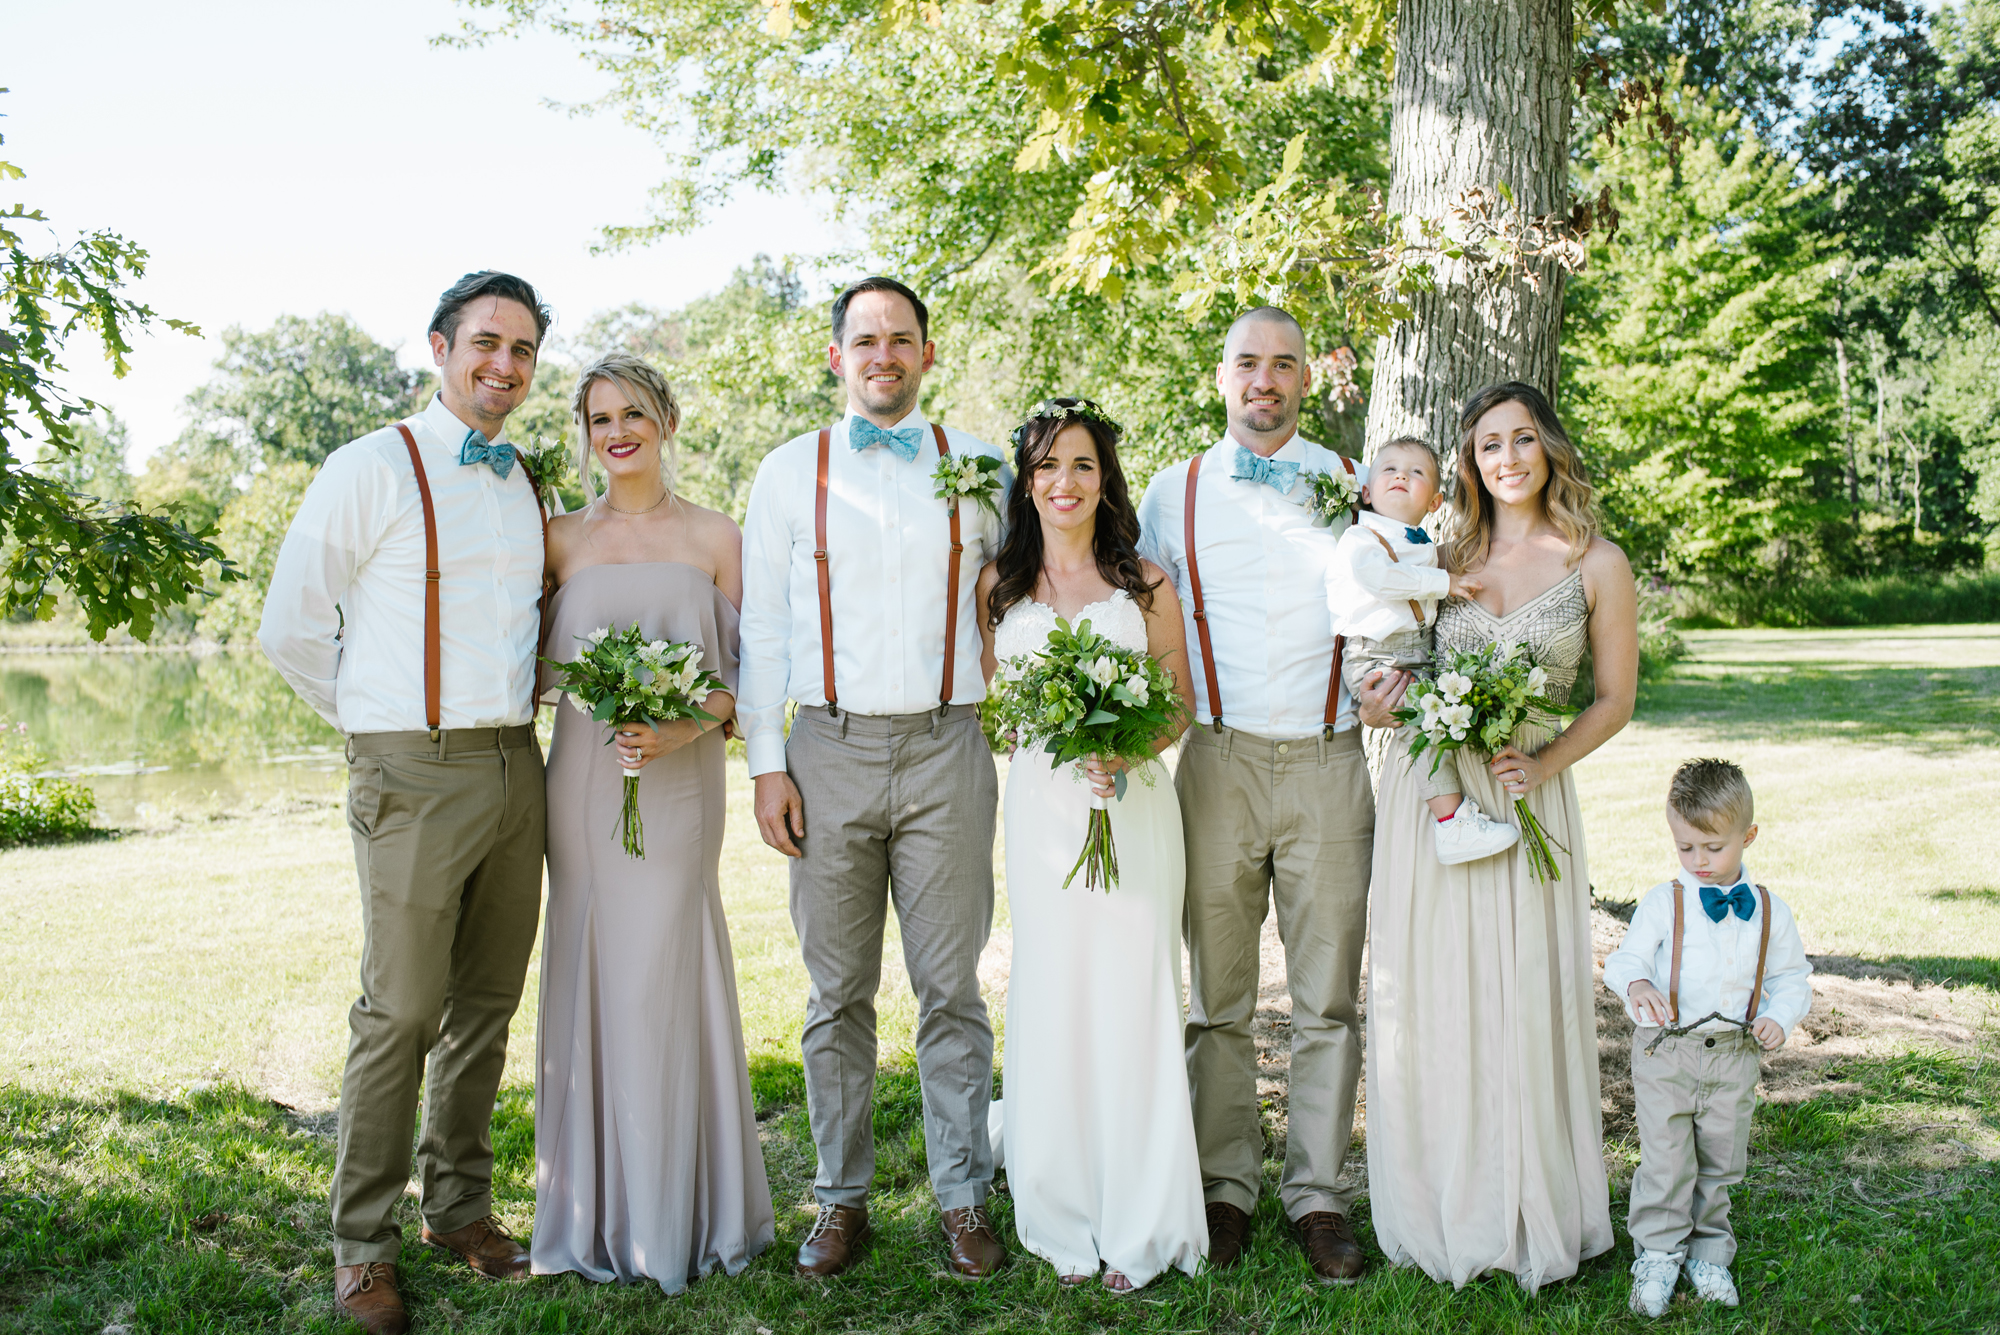 Quincy-Coldwater-Michigan-farm-wedding-photogapher-sydney-marie (216).jpg